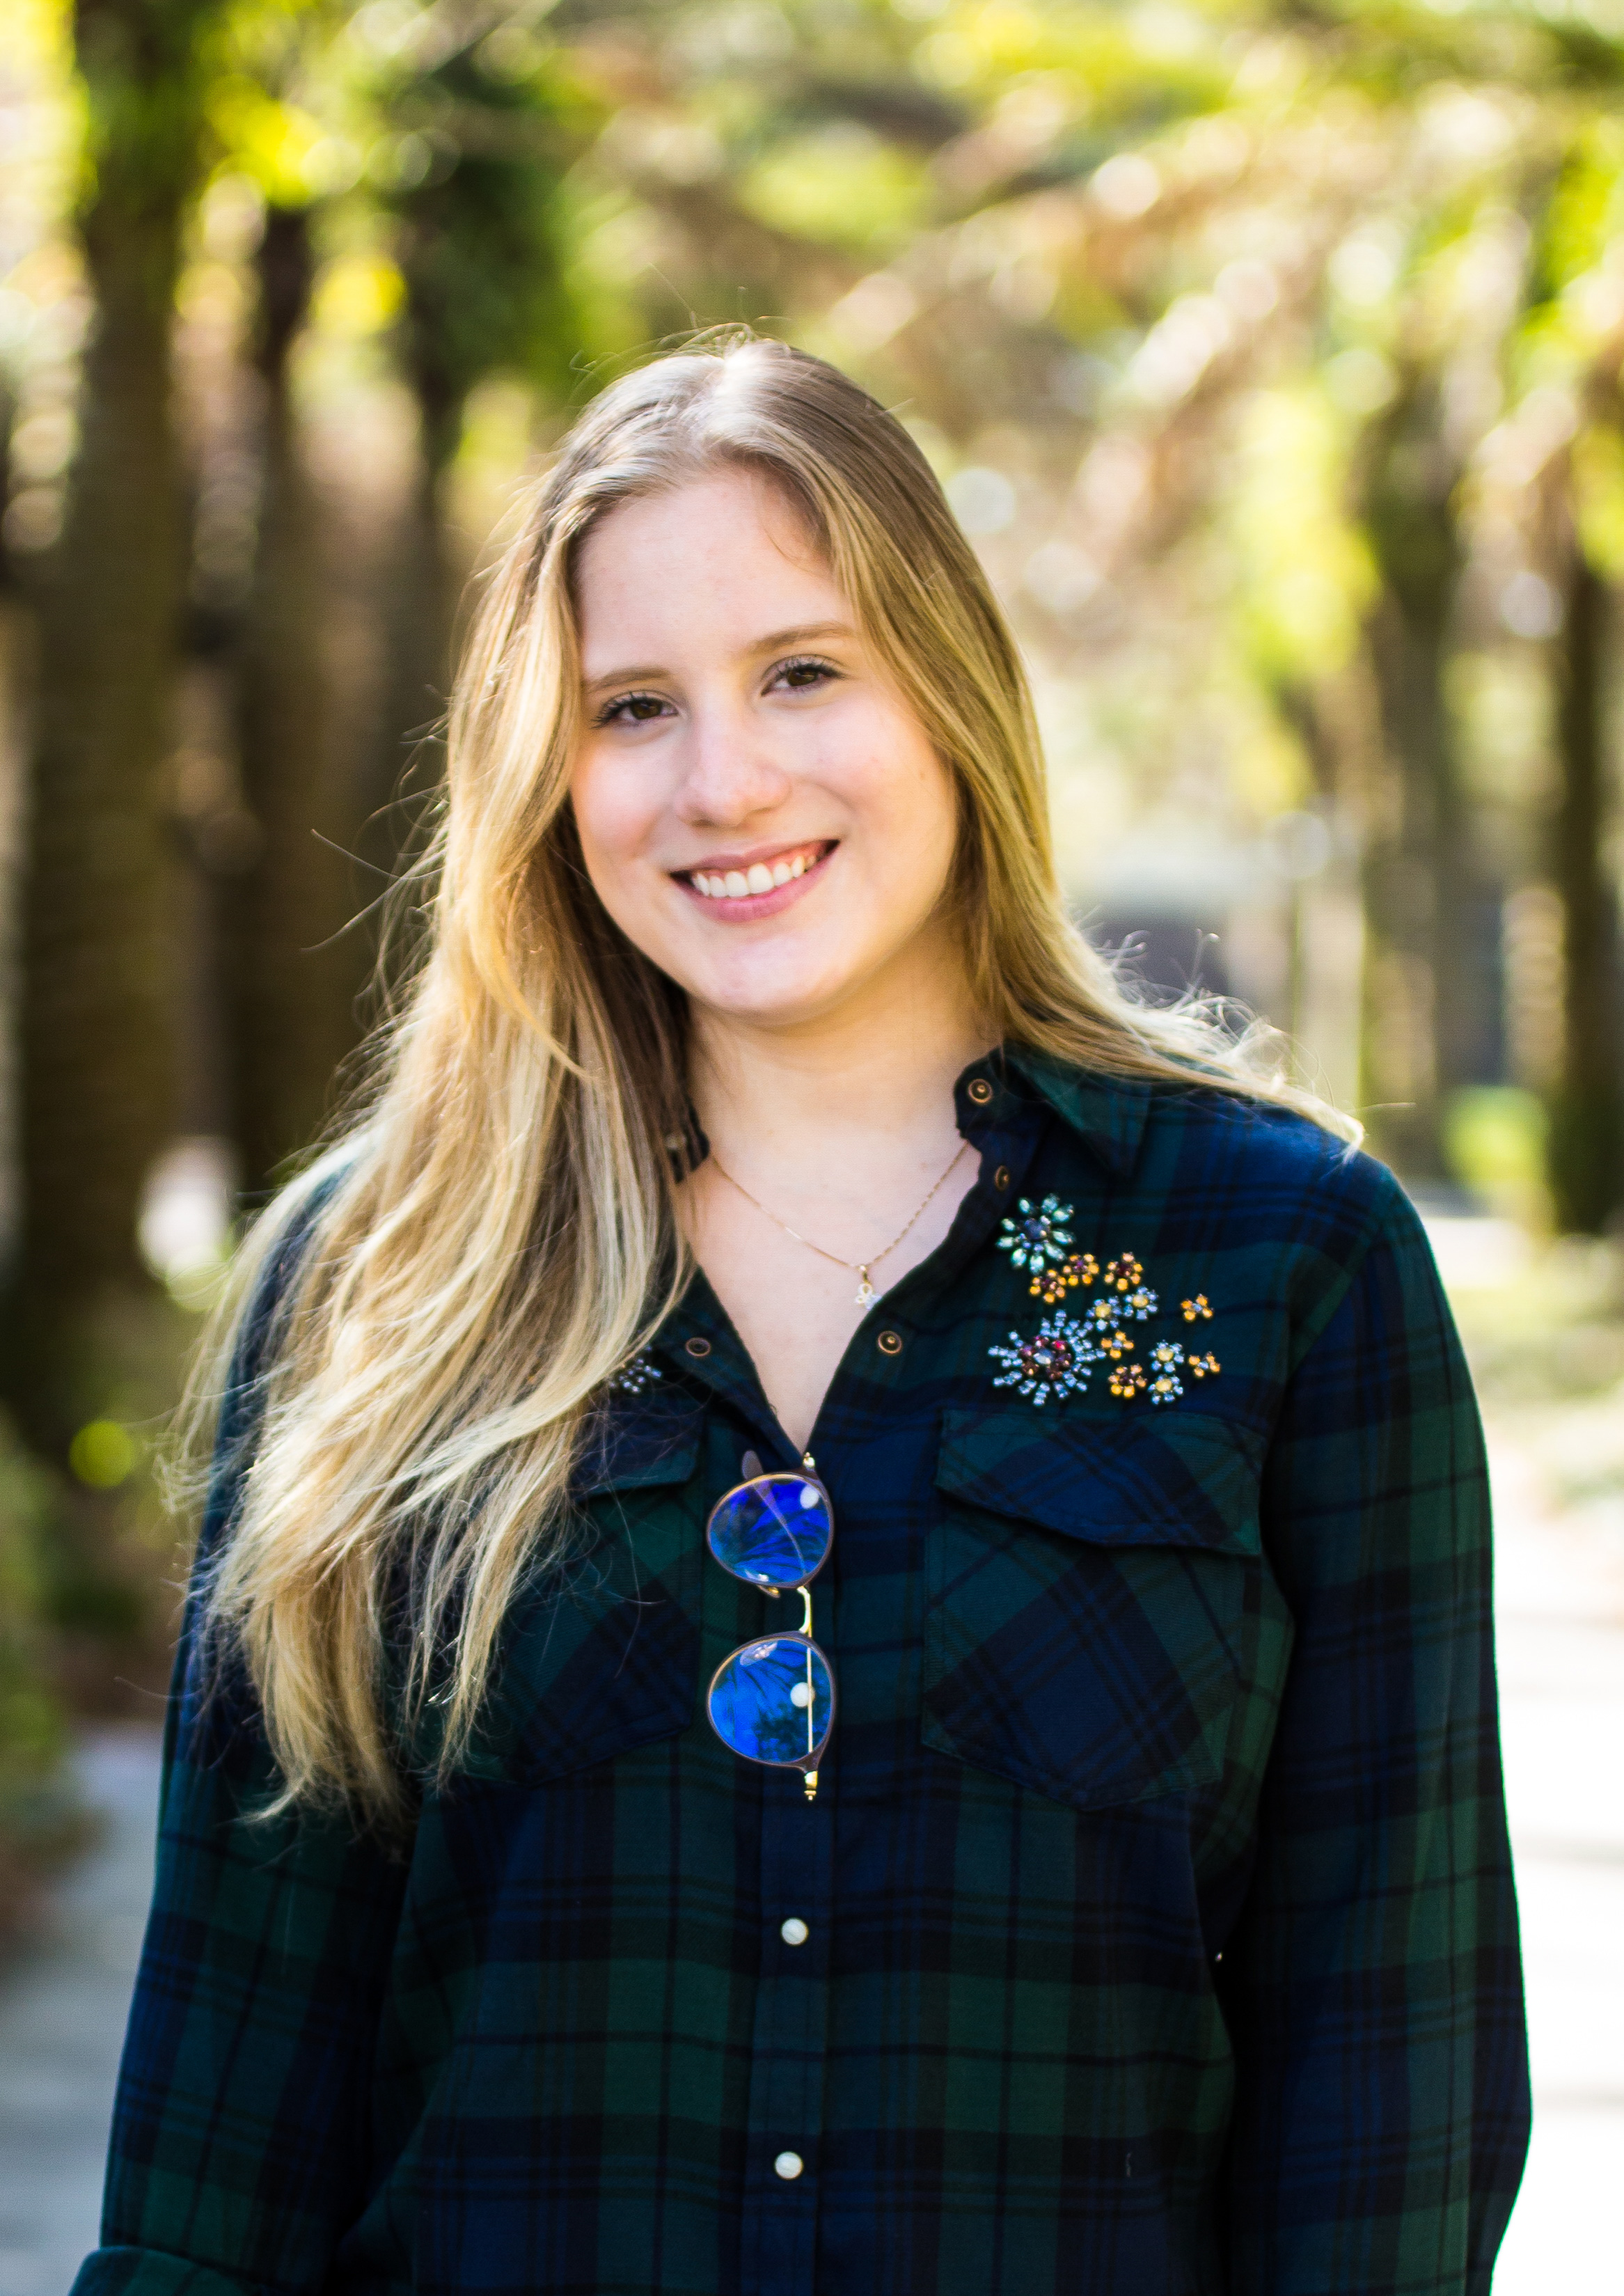 Maria, USF student